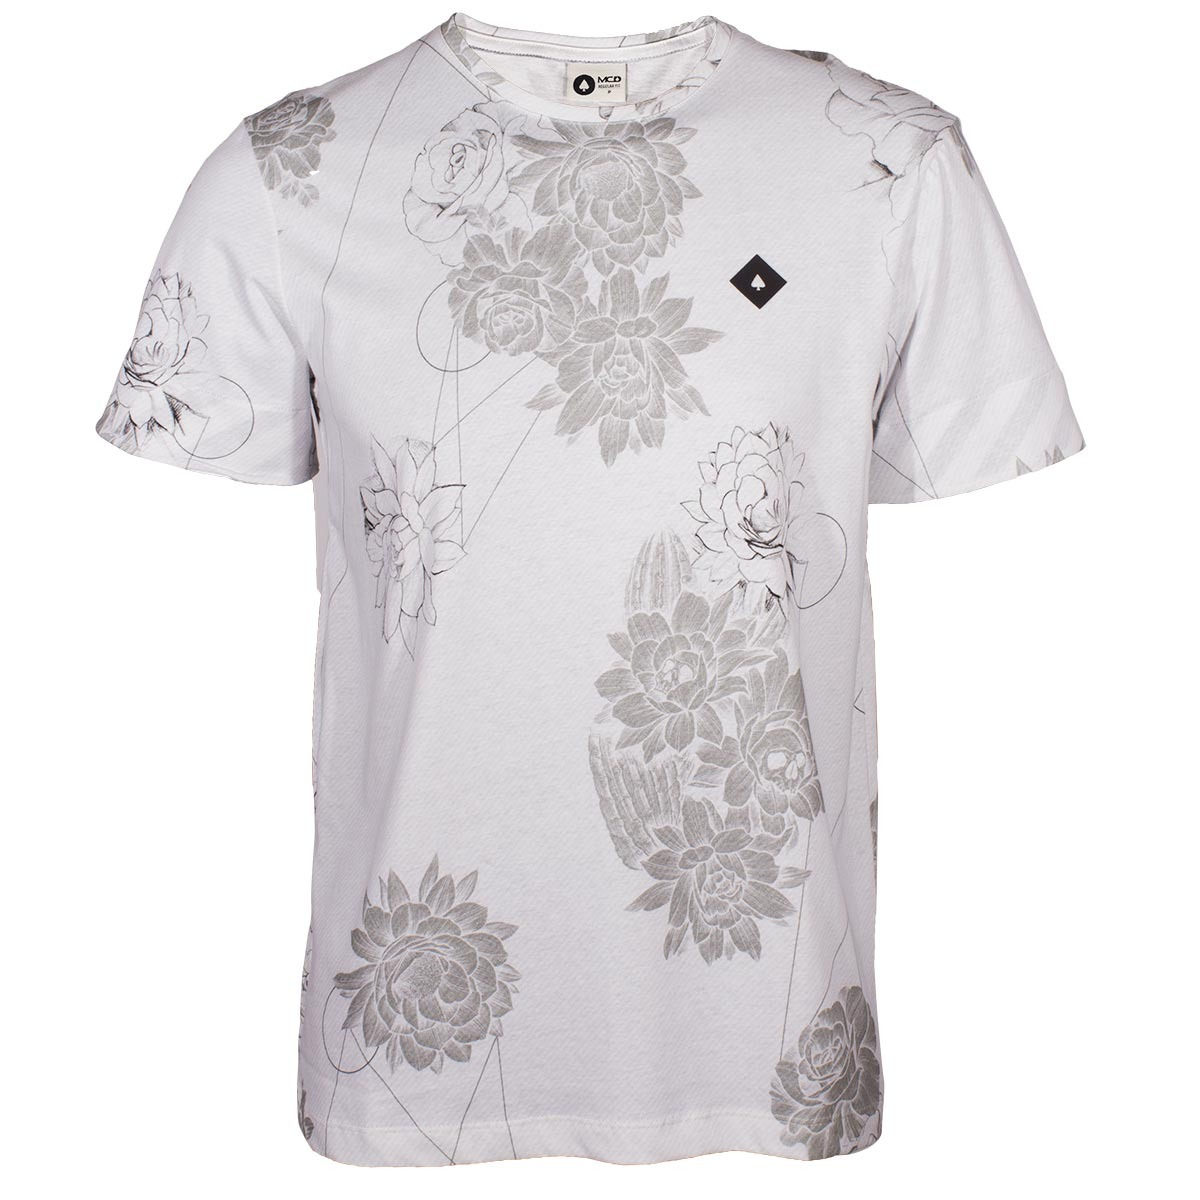 camiseta mcd geo flower - branco cinza. Carregando zoom. f5816a19a52